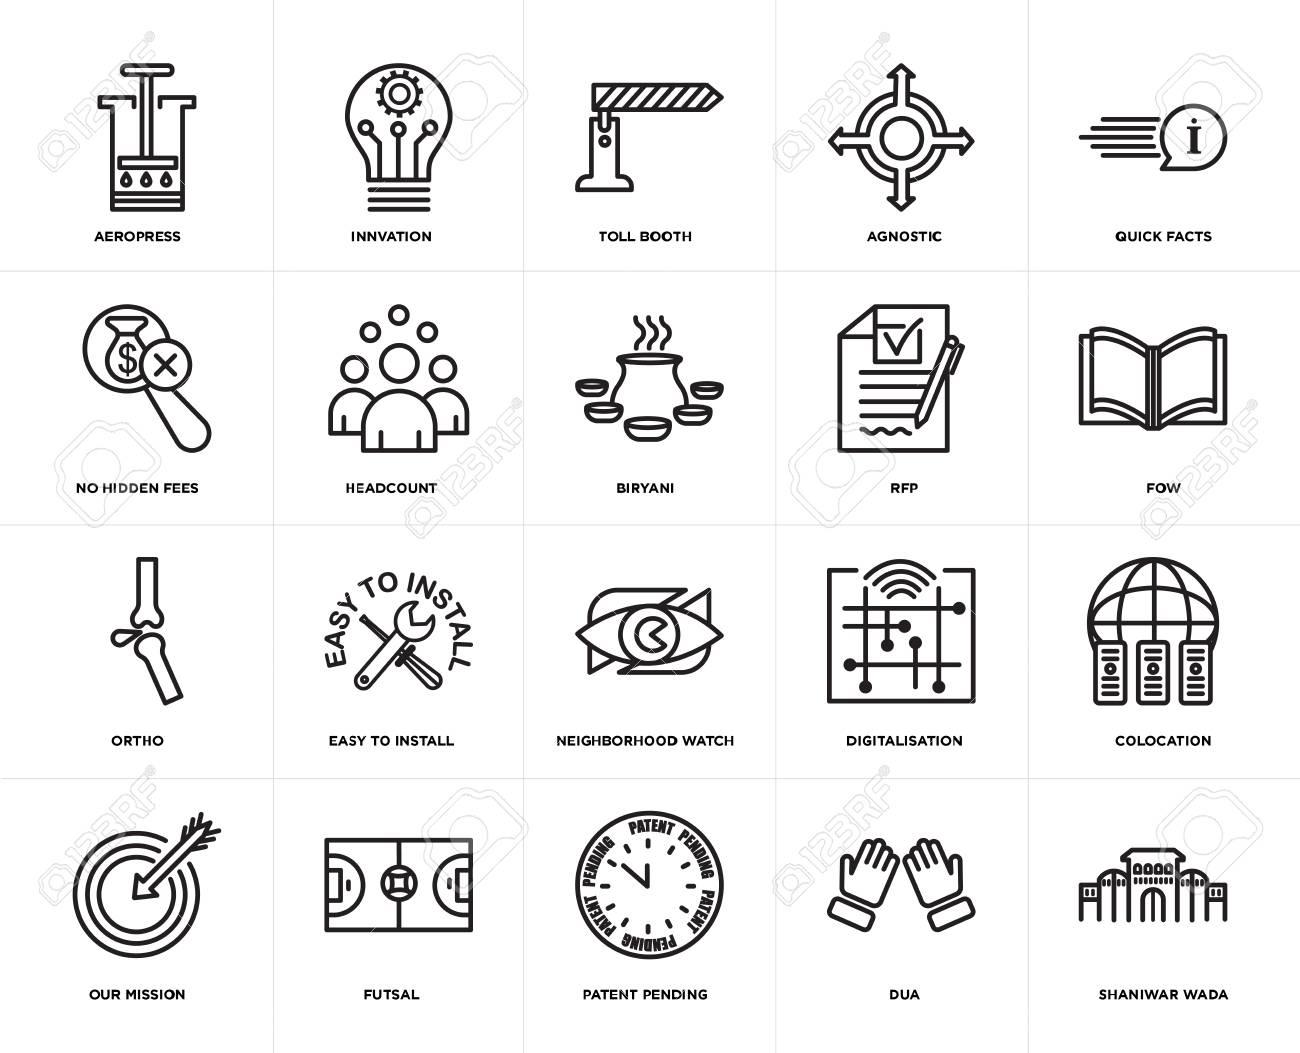 Set Of 20 icons such as shaniwar wada, dua, patent pending, futsal,